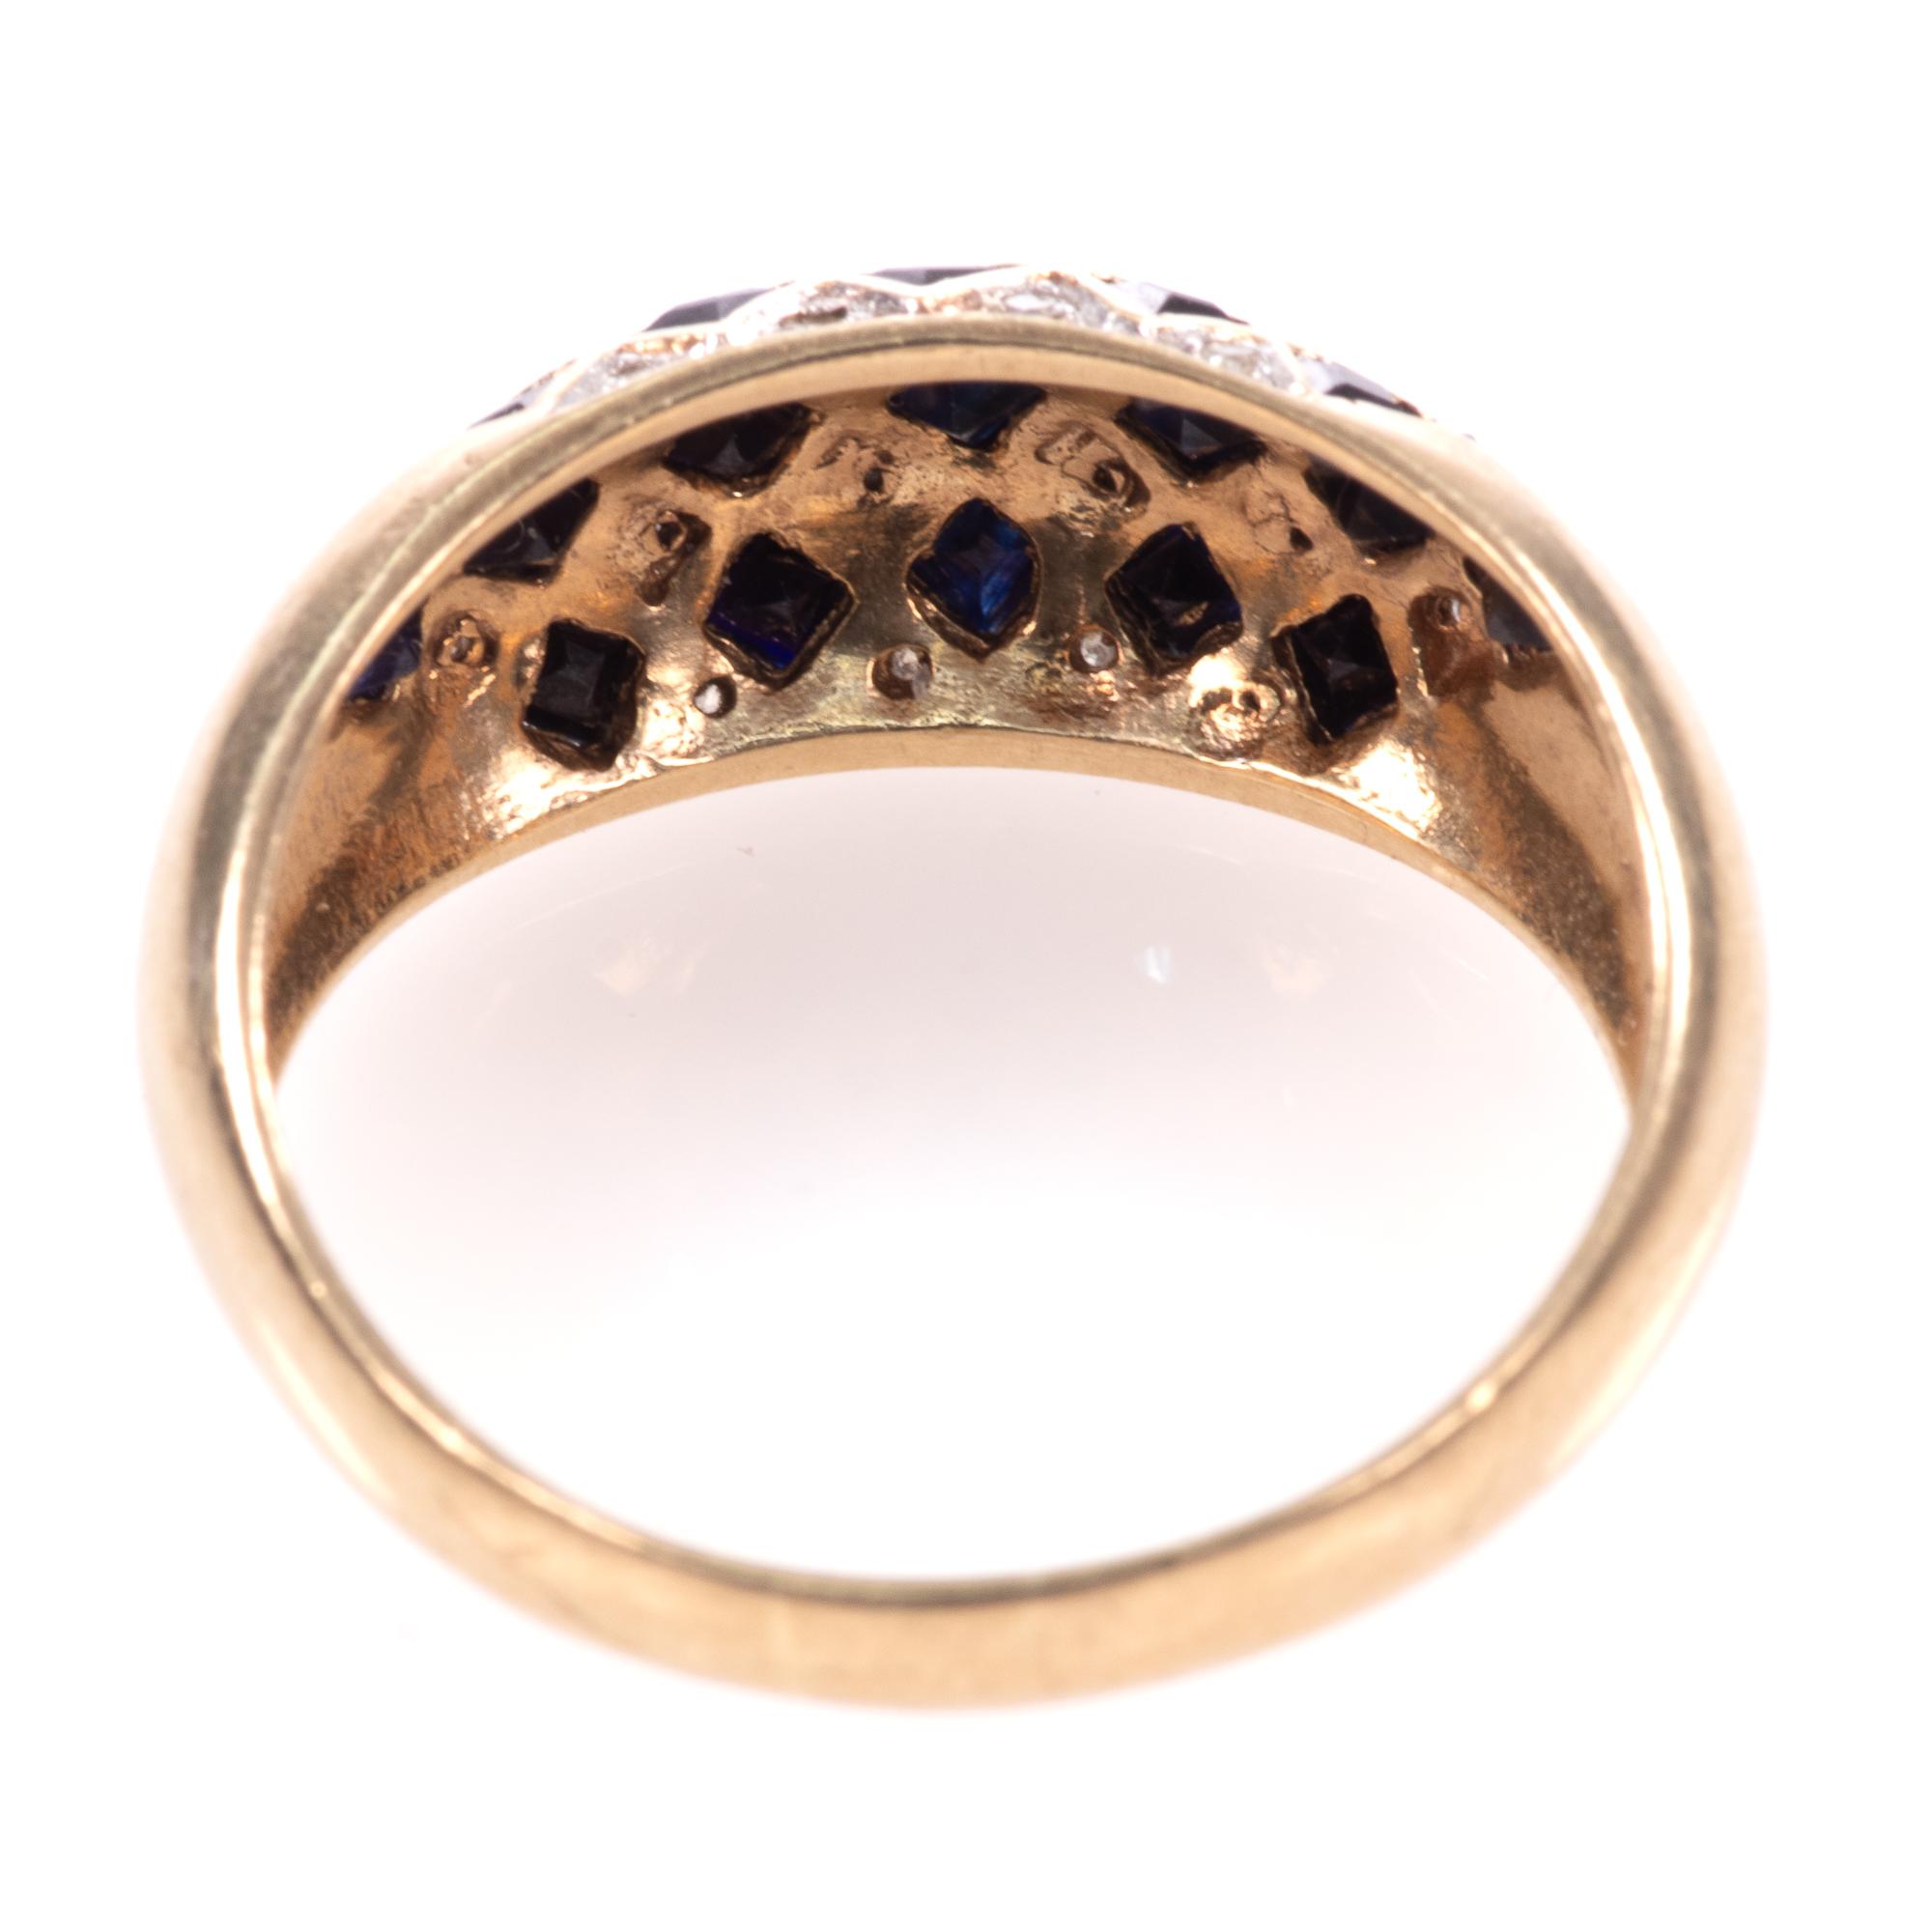 9ct Gold Art Deco Style 0.68ct Sapphire & Diamond Ring - Image 6 of 8